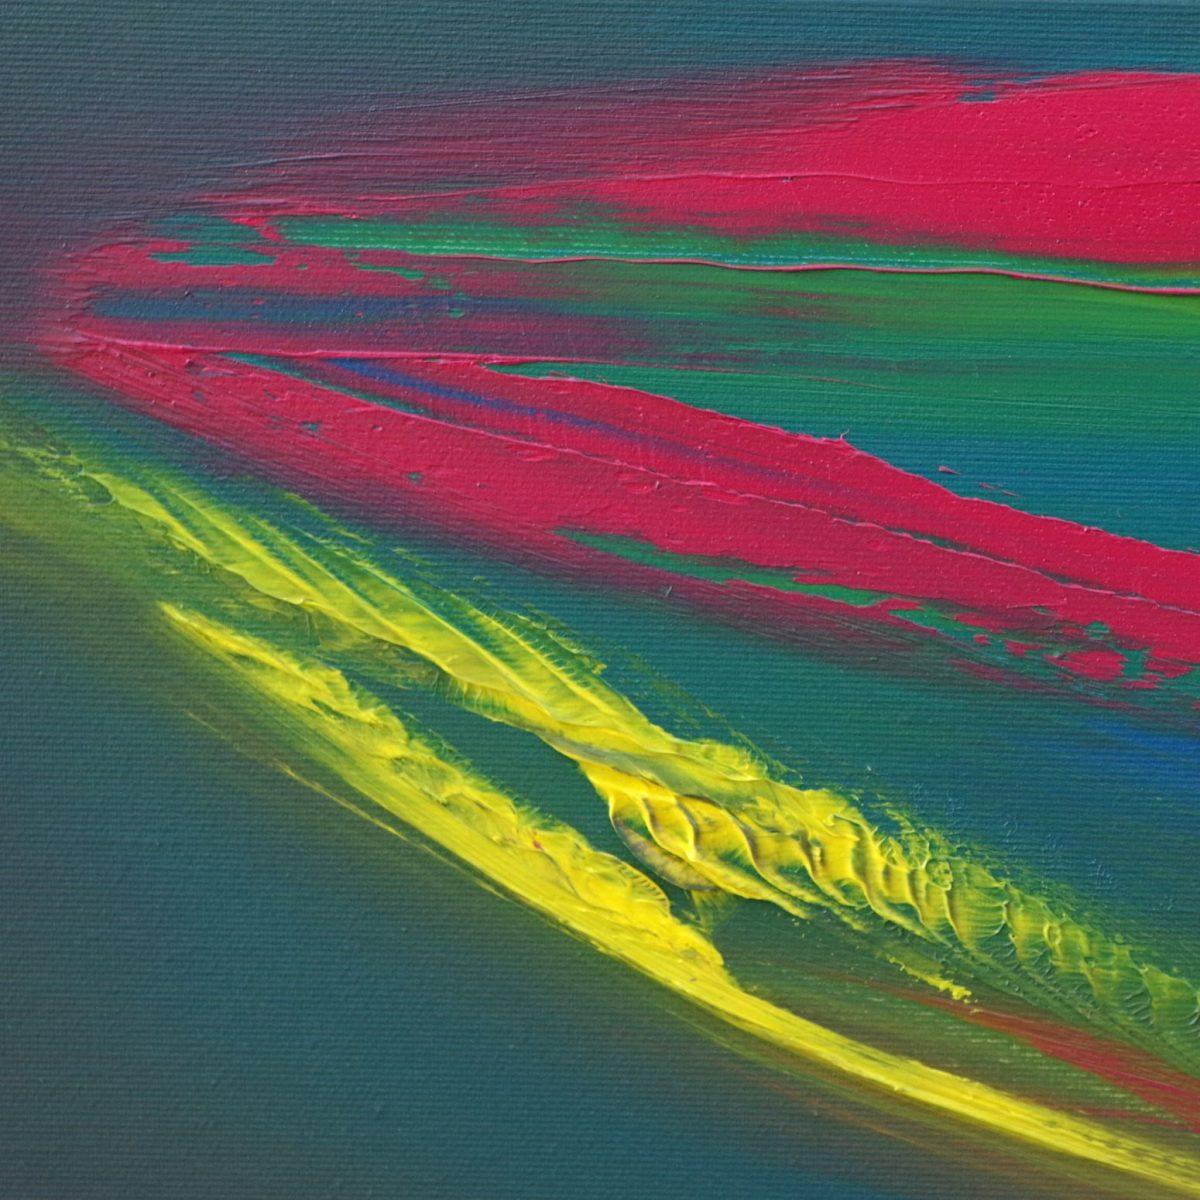 bohème 40X50 olio su tela quadro moderno